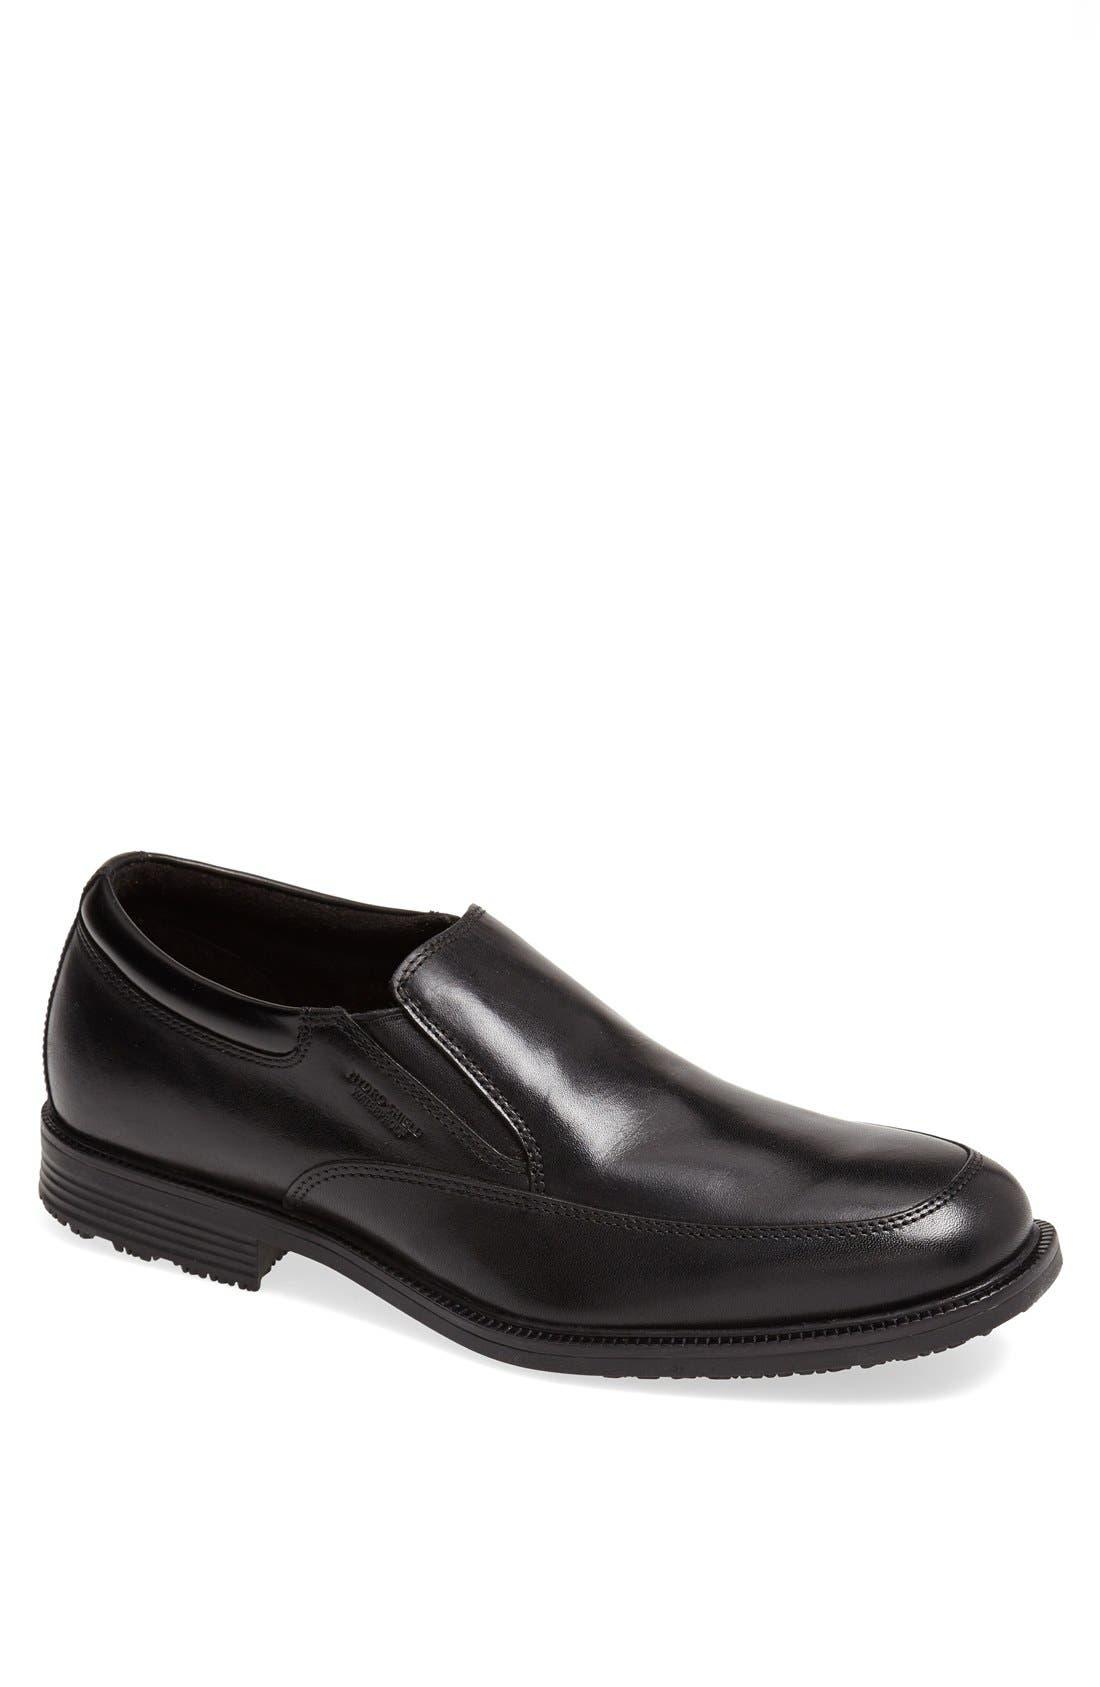 'Essential Details' Waterproof Loafer,                         Main,                         color,